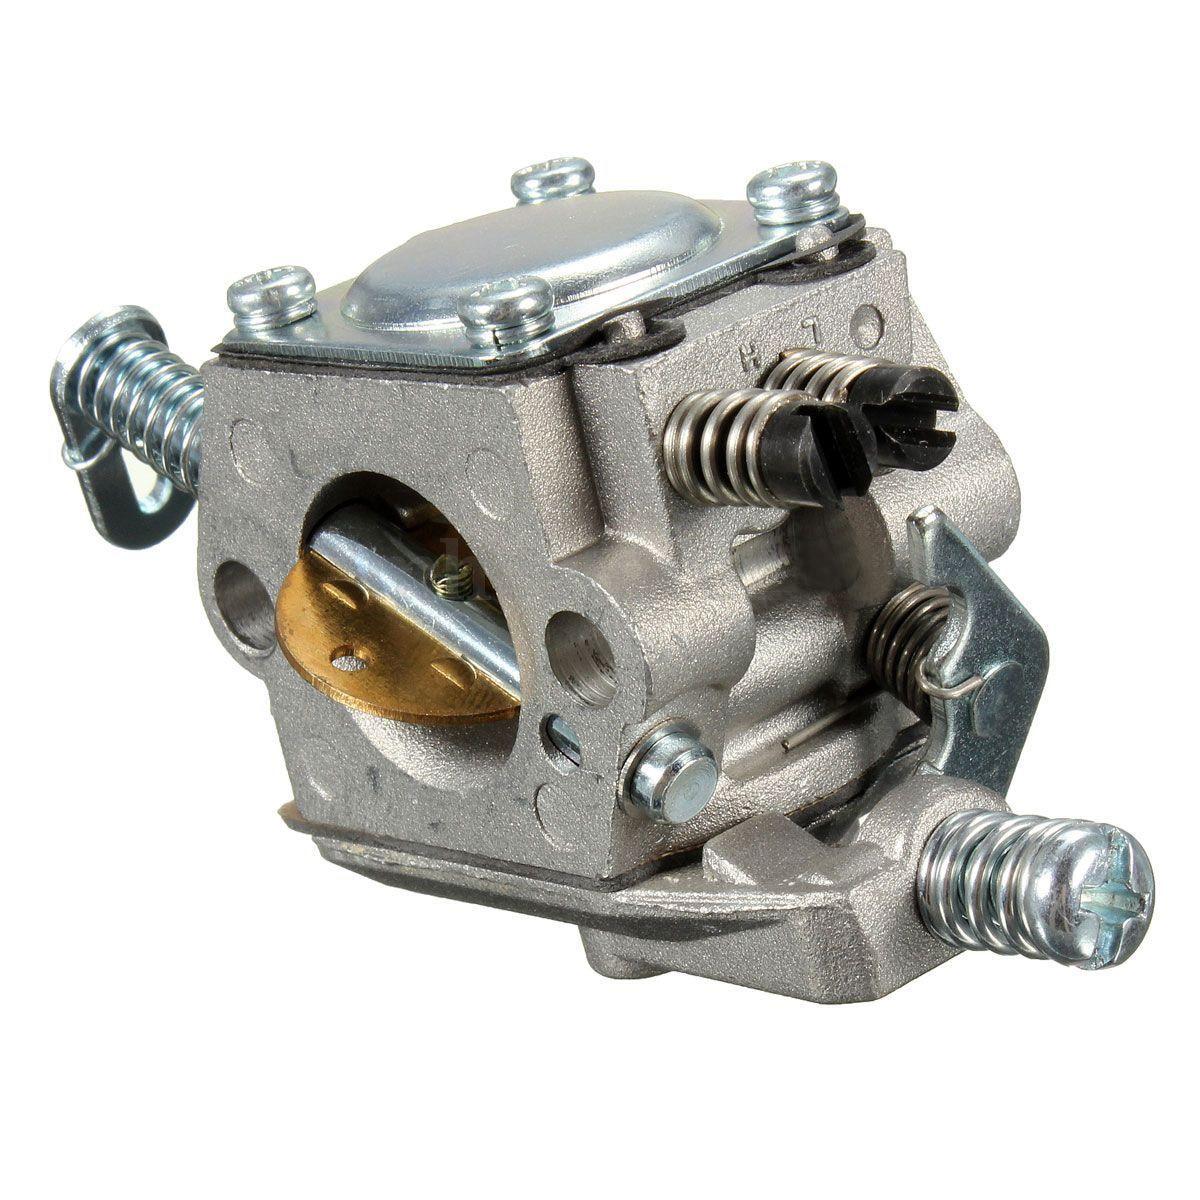 Carburador para STIHL 025 023 021 MS250 MS230 Zama motosierra Walbro reemplazar plata